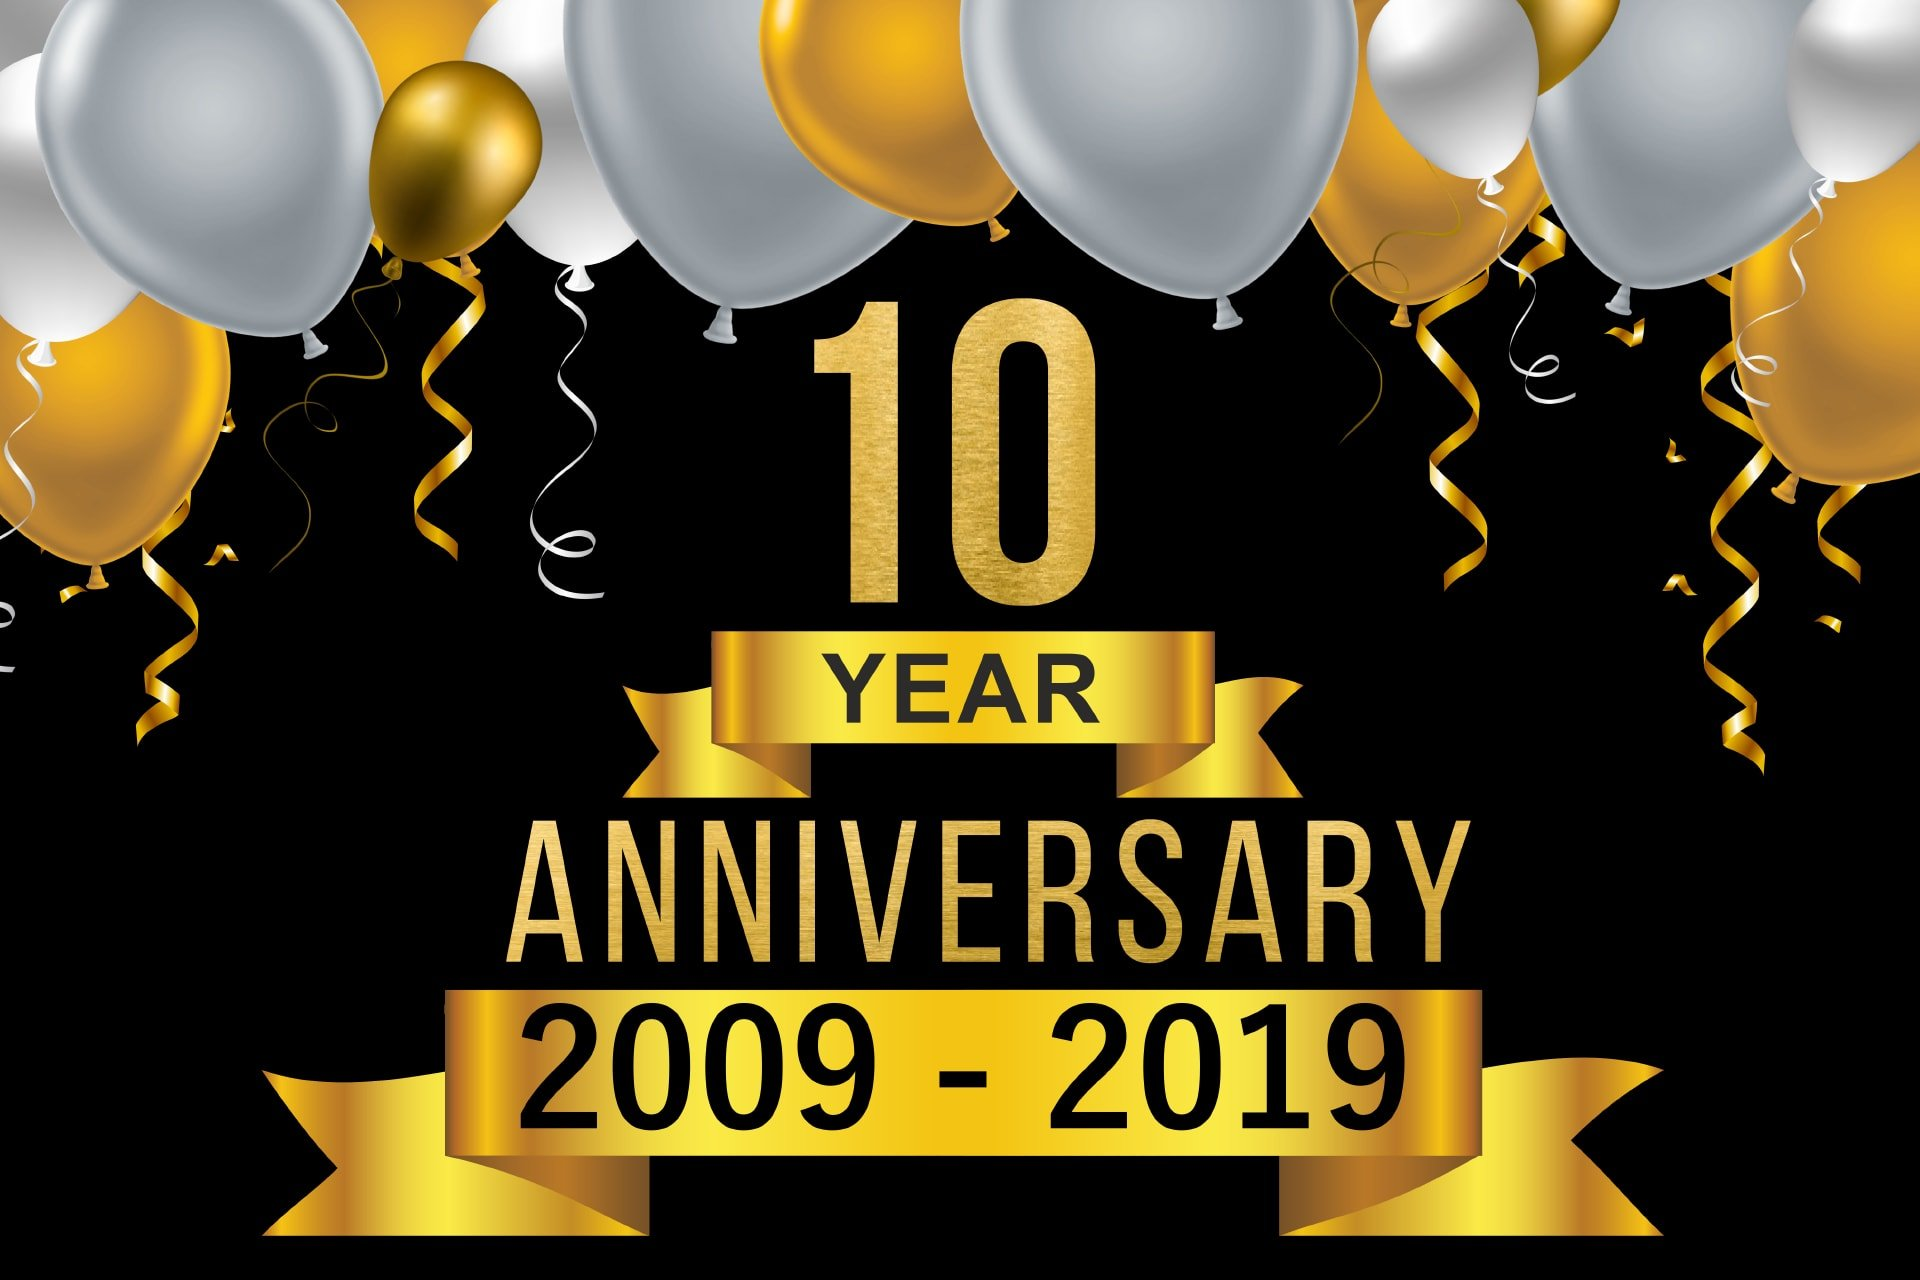 10 Year Anniversary - Euro Digital Systems